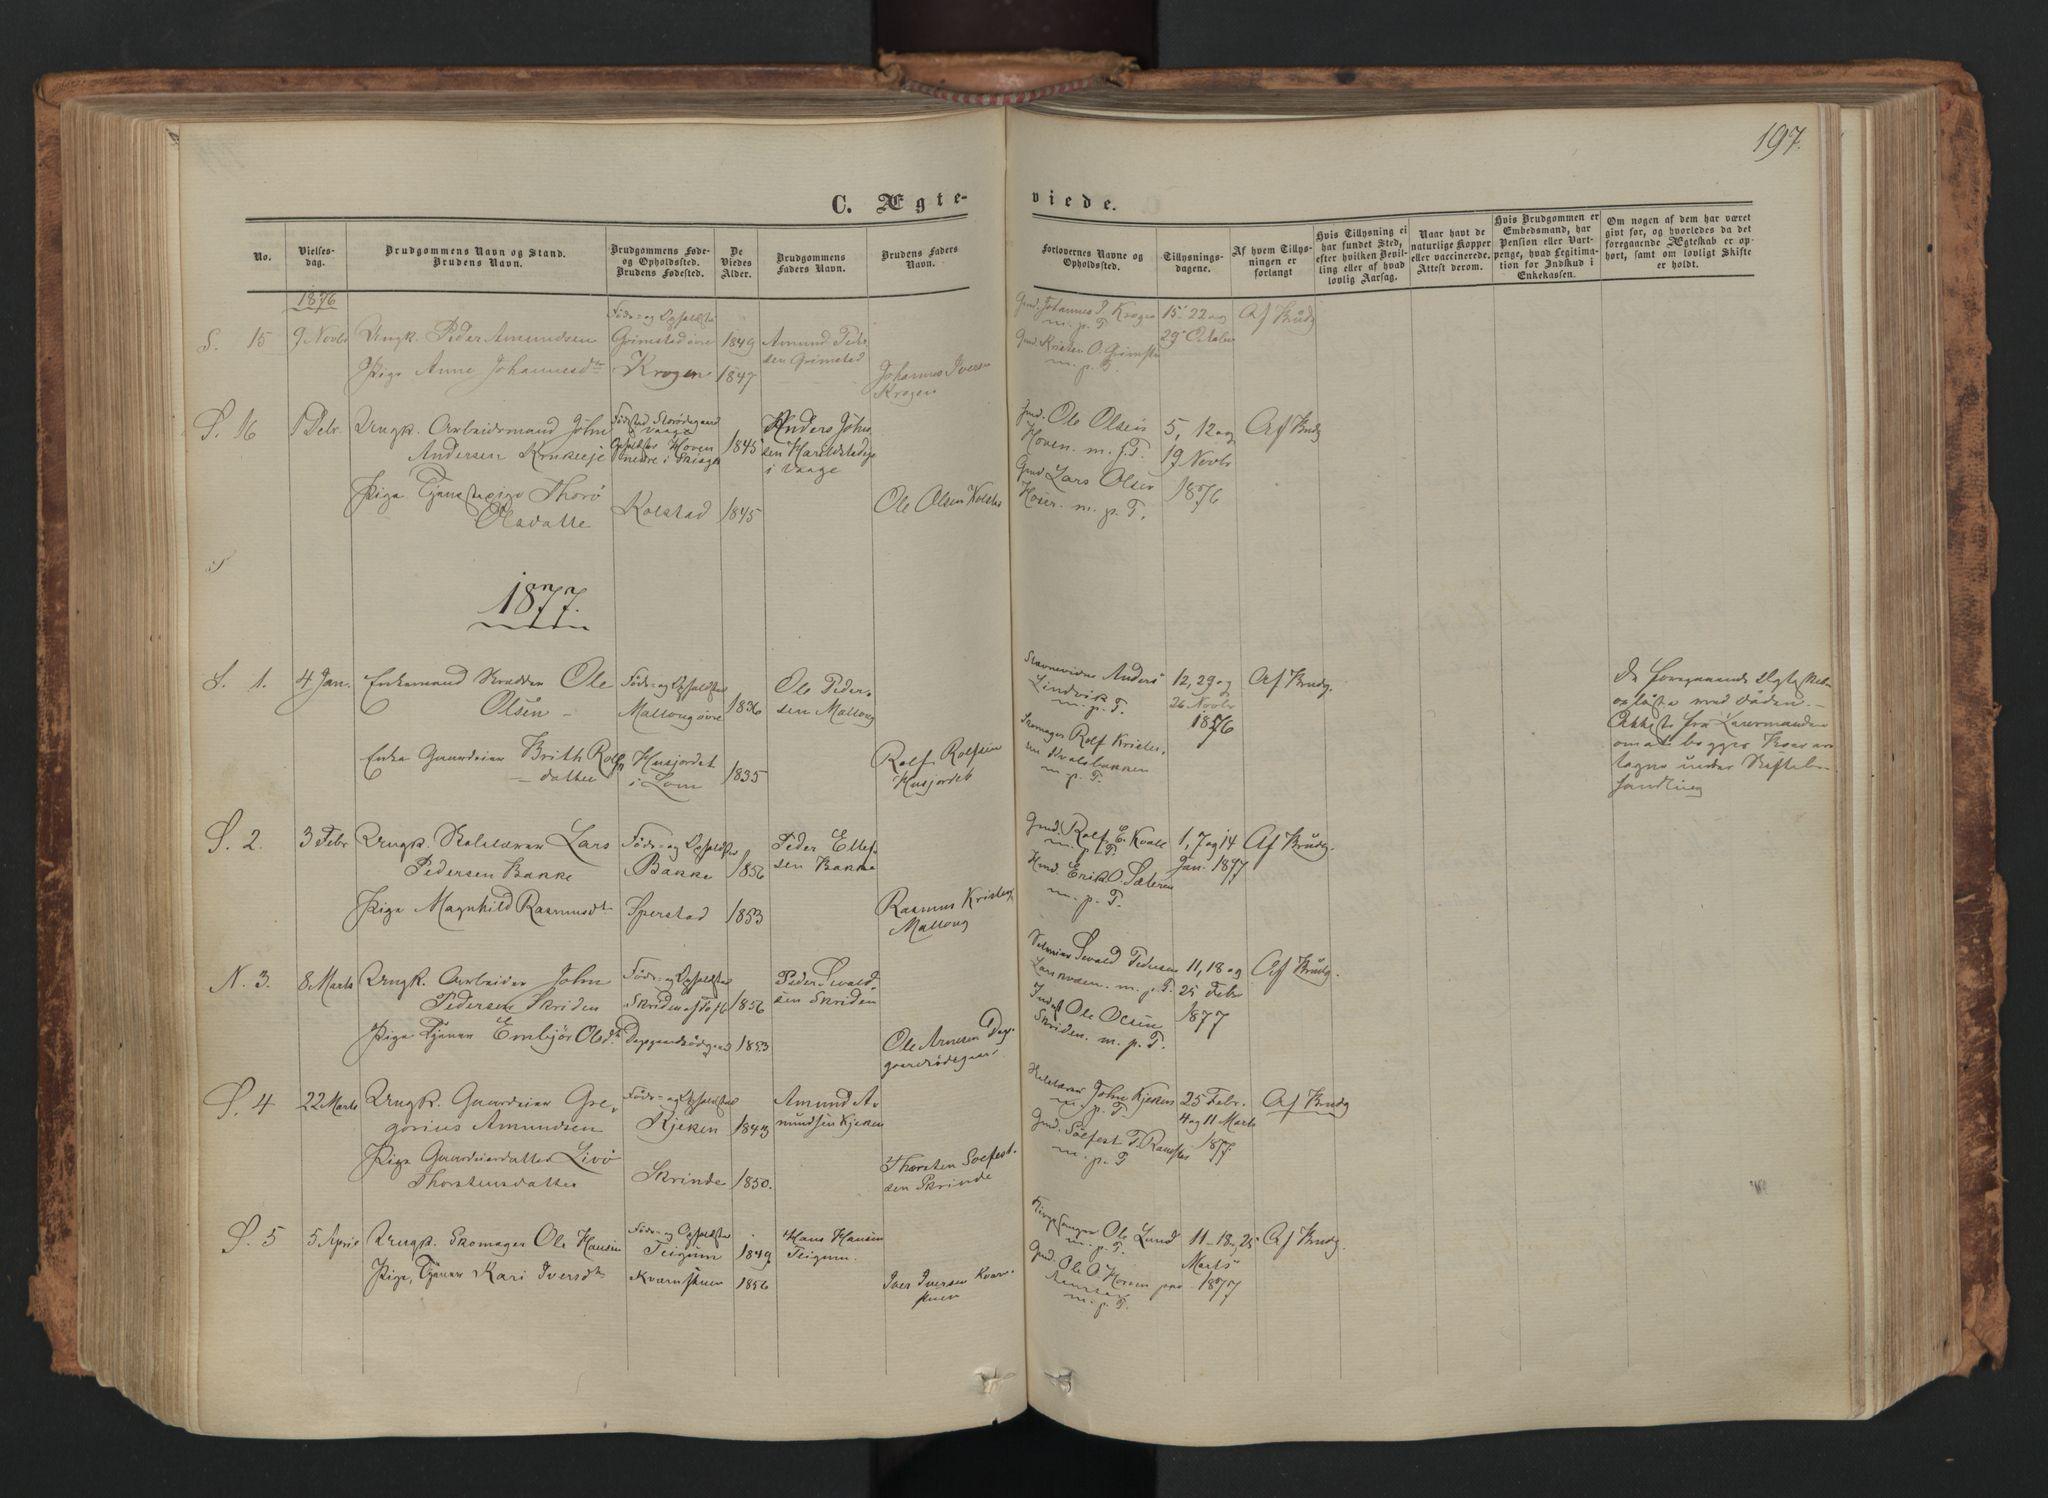 SAH, Skjåk prestekontor, Ministerialbok nr. 1, 1863-1879, s. 197